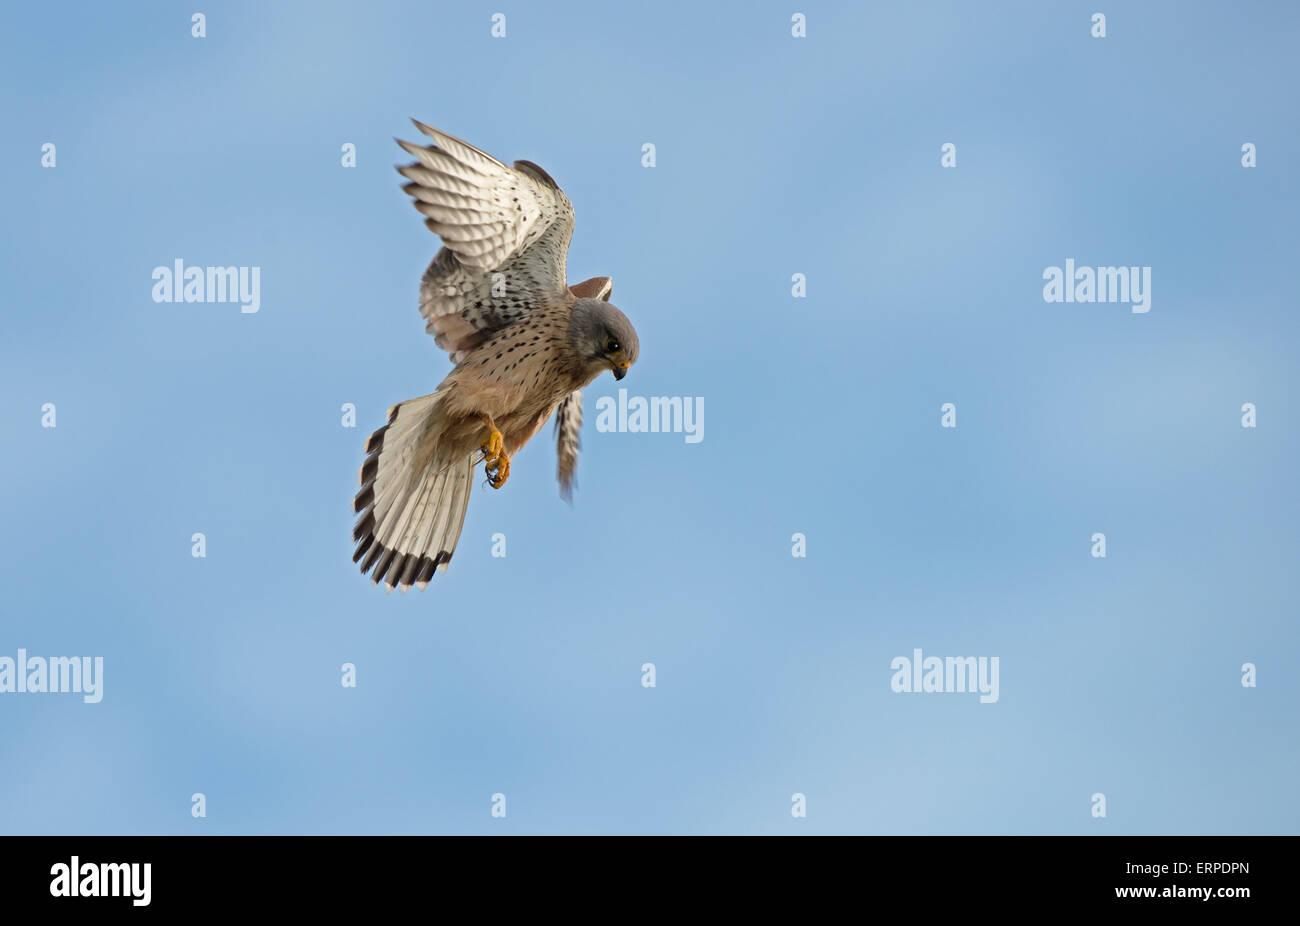 Male Kestrel, Falco-tinnunculus hovers. Spring. Uk - Stock Image